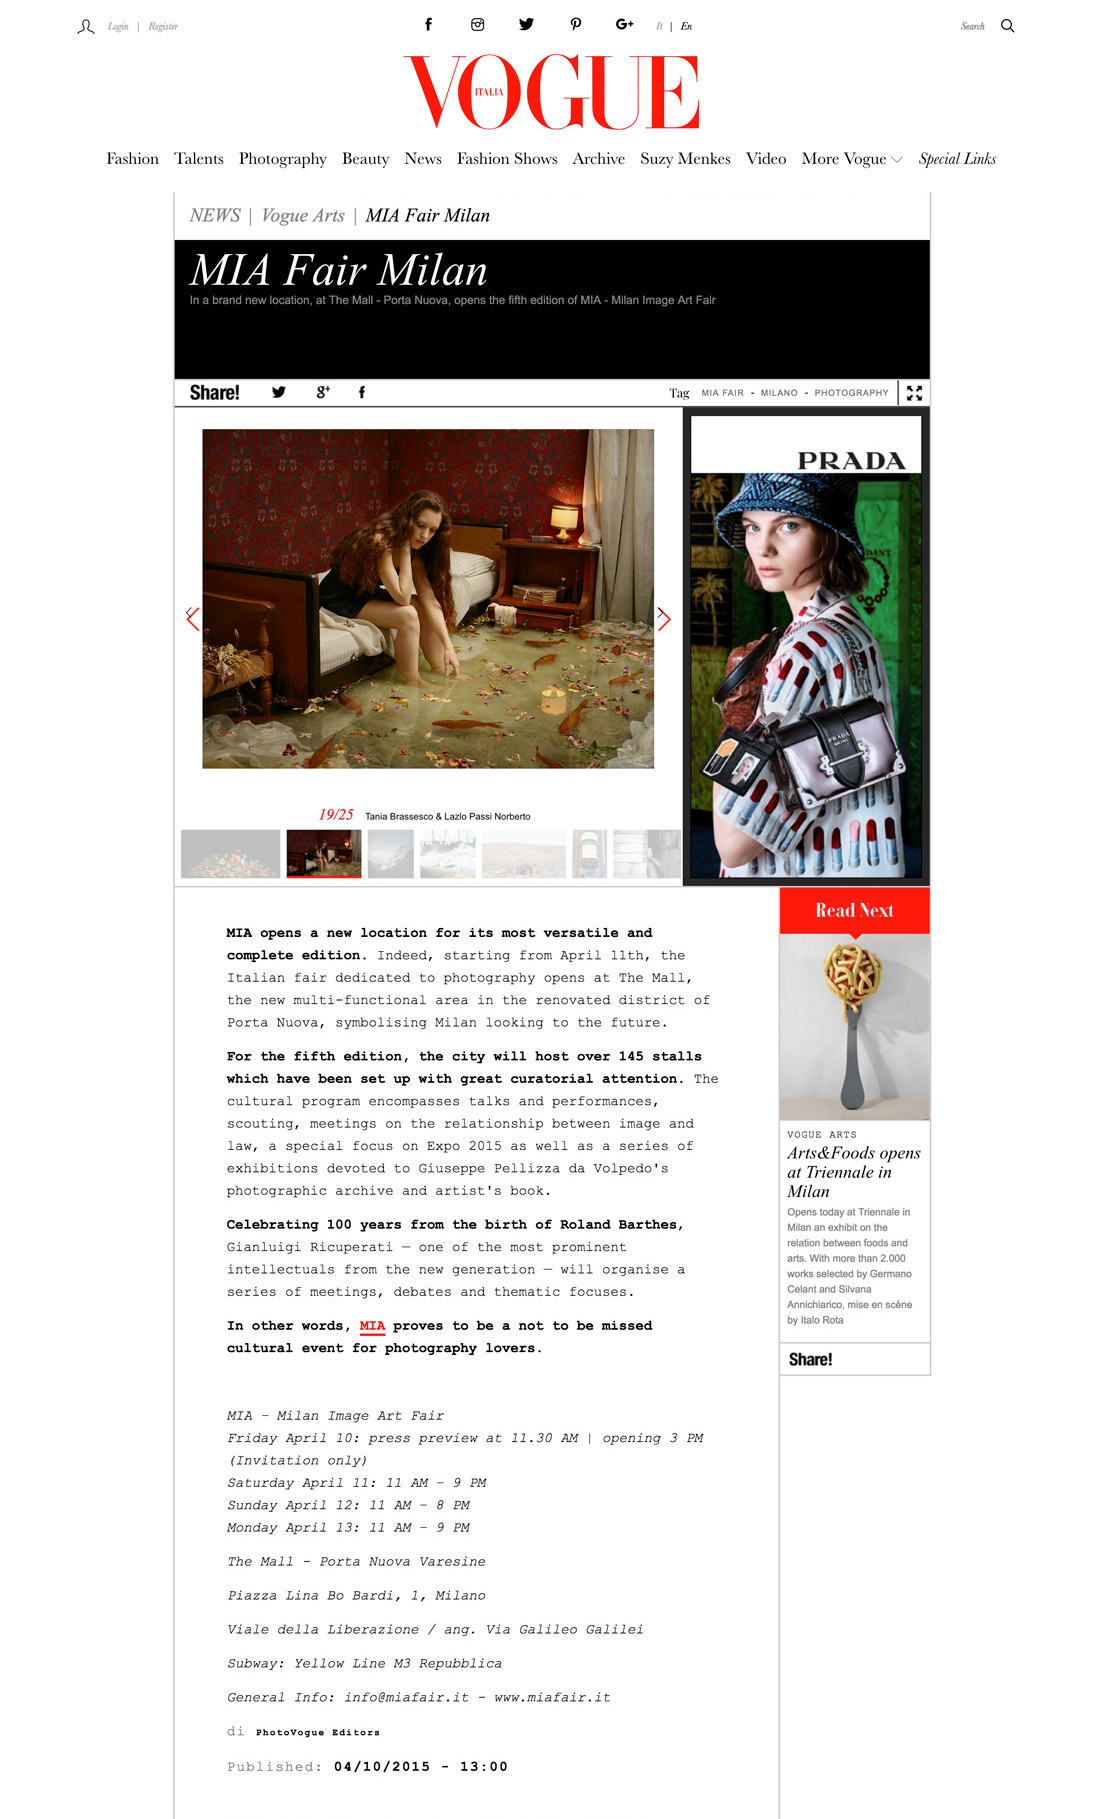 Vogue-unito-web copy.jpg